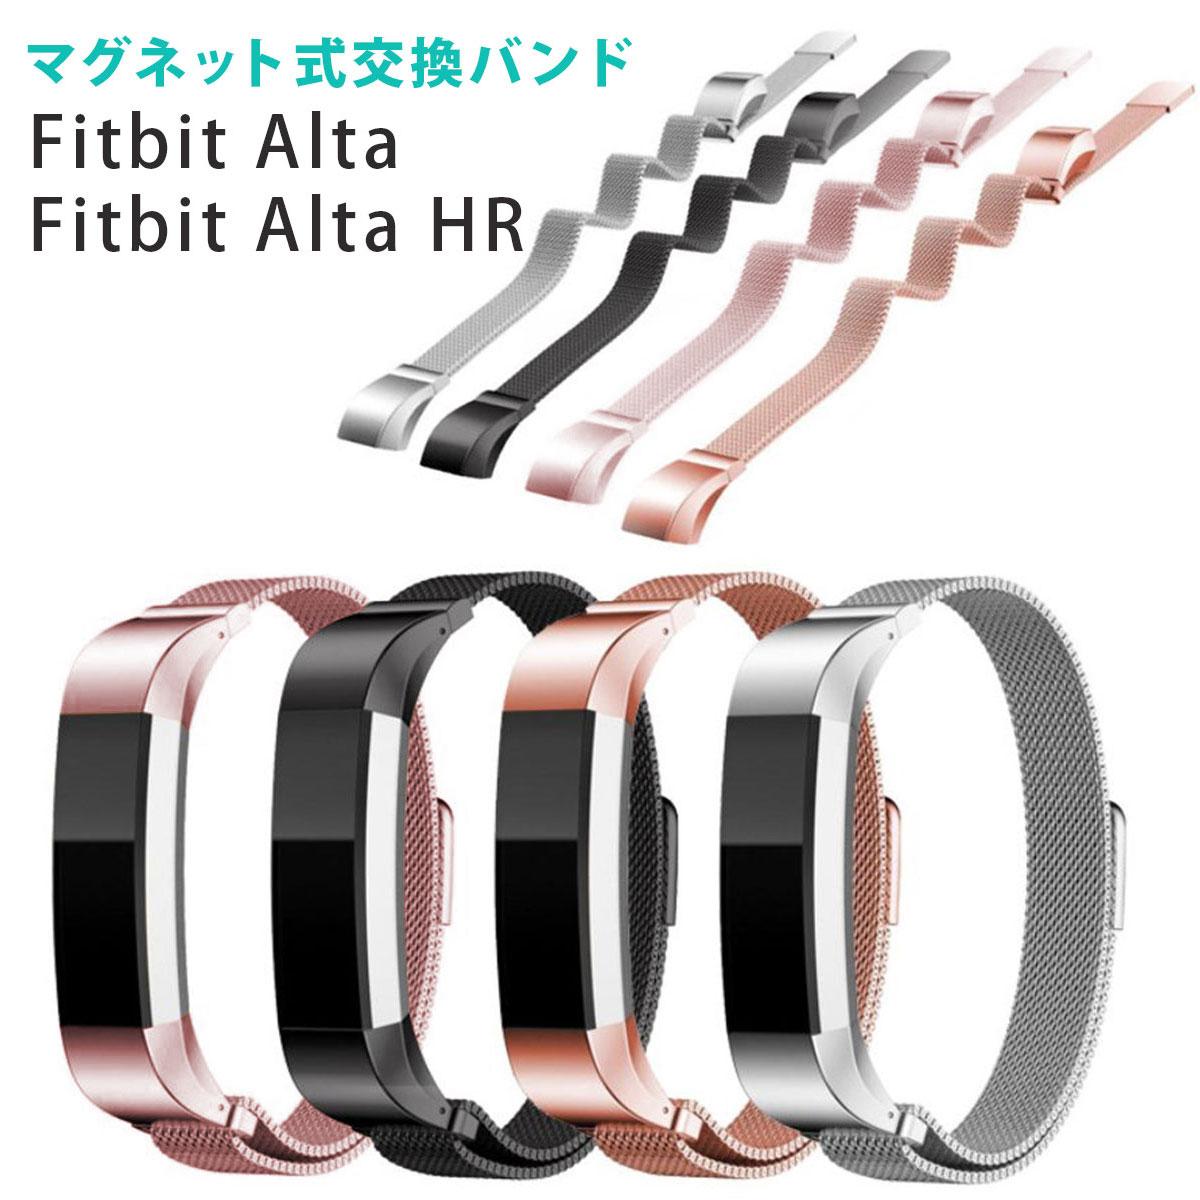 Fitbit 在庫あり 爆買い新作 Alta HR 交換 バンド ステンレス フィットビット 対応 ベルト アルタ